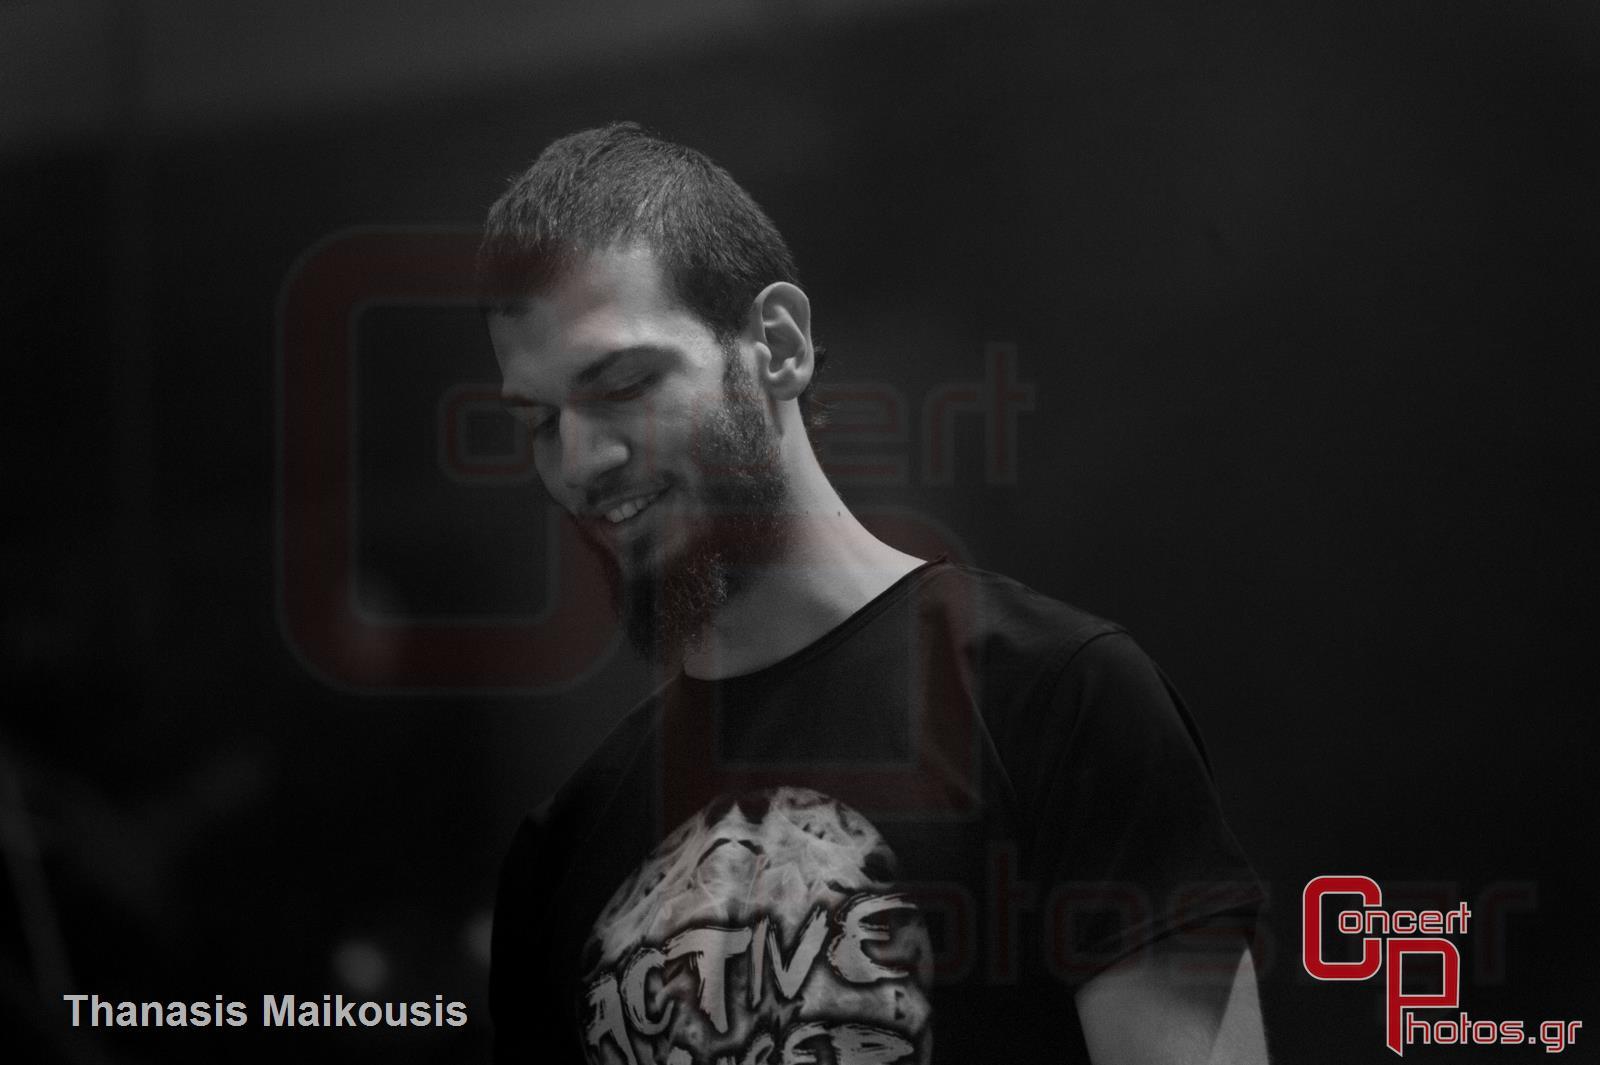 Active Member - Τραγούδα μας να φύγει το σκοτάδι- photographer: Thanasis Maikousis - concertphotos_-4982